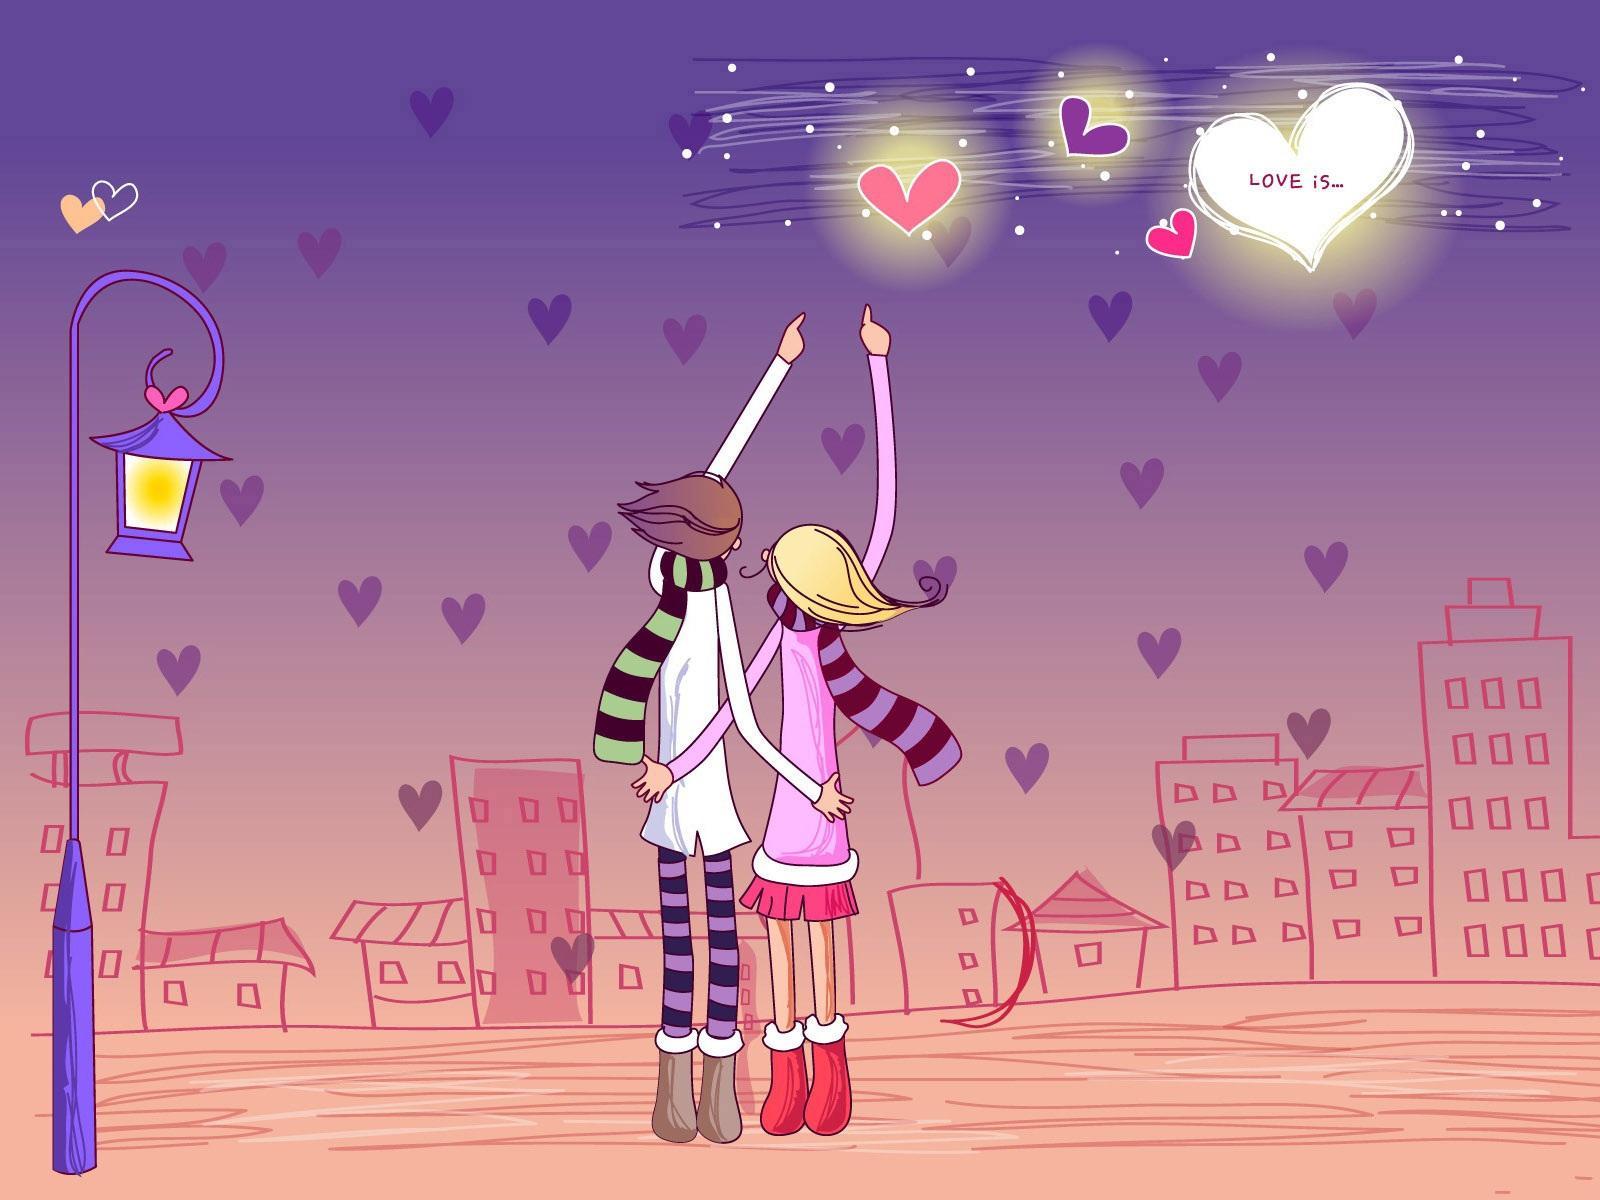 Cute Boy And Girl Friendship Wallpapers Girly Wallpapers Hd Free Download Pixelstalk Net